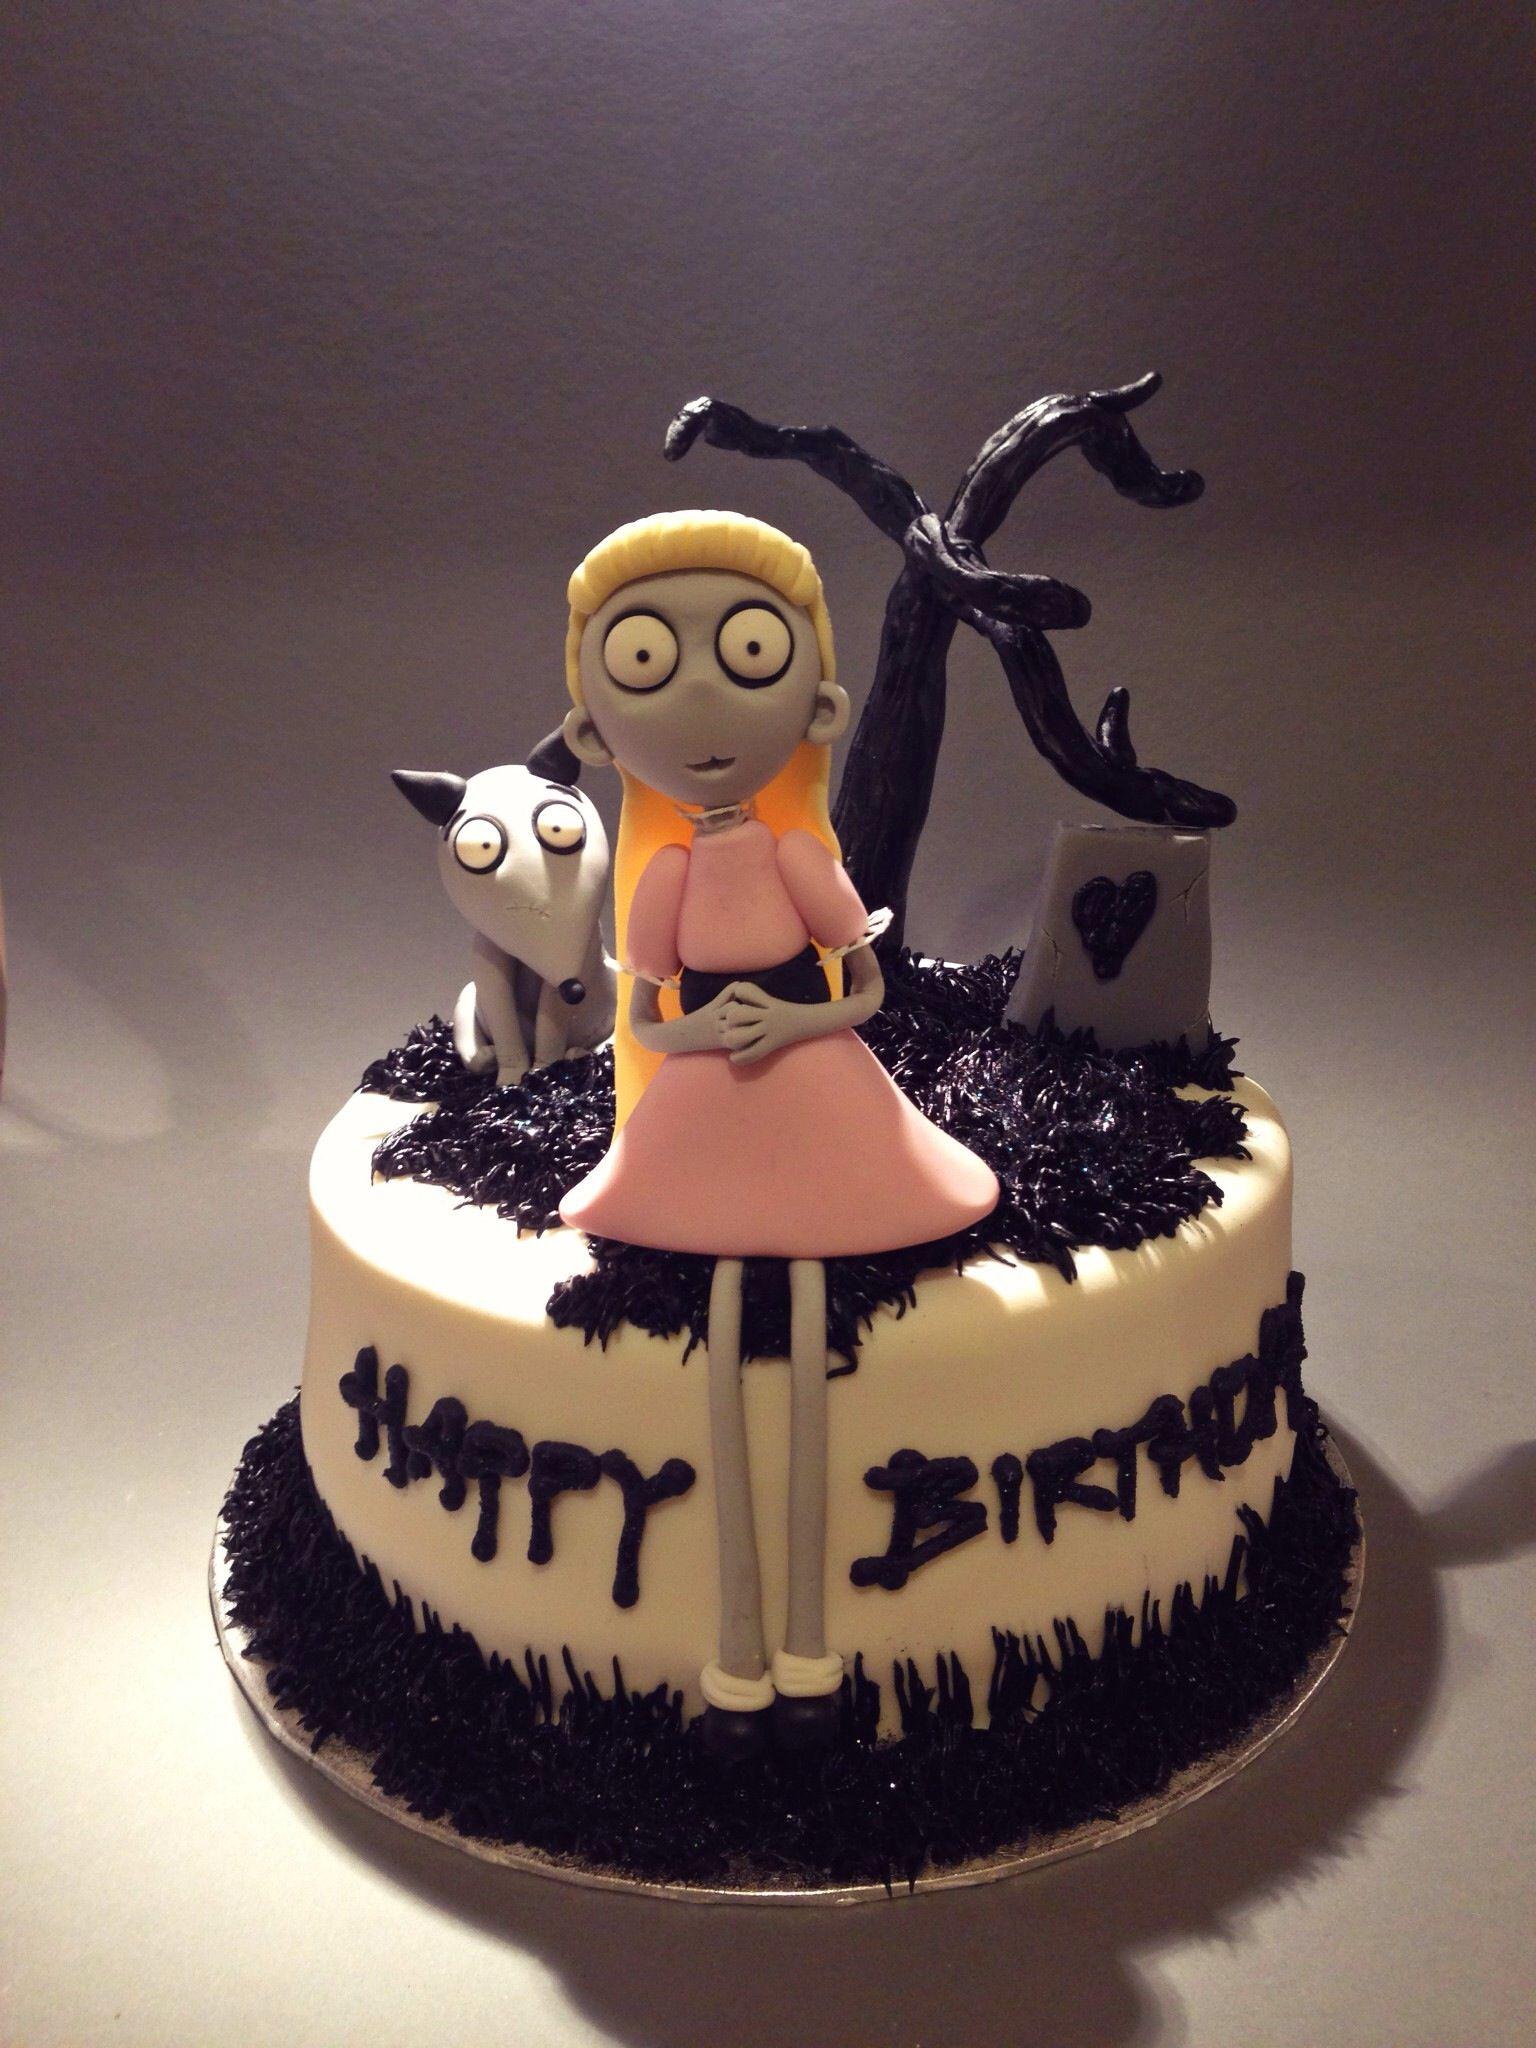 Frankenweenie Cake, Fondant FrankenweenieCorpse Bride Pinterest - Halloween Cake Decorating Ideas